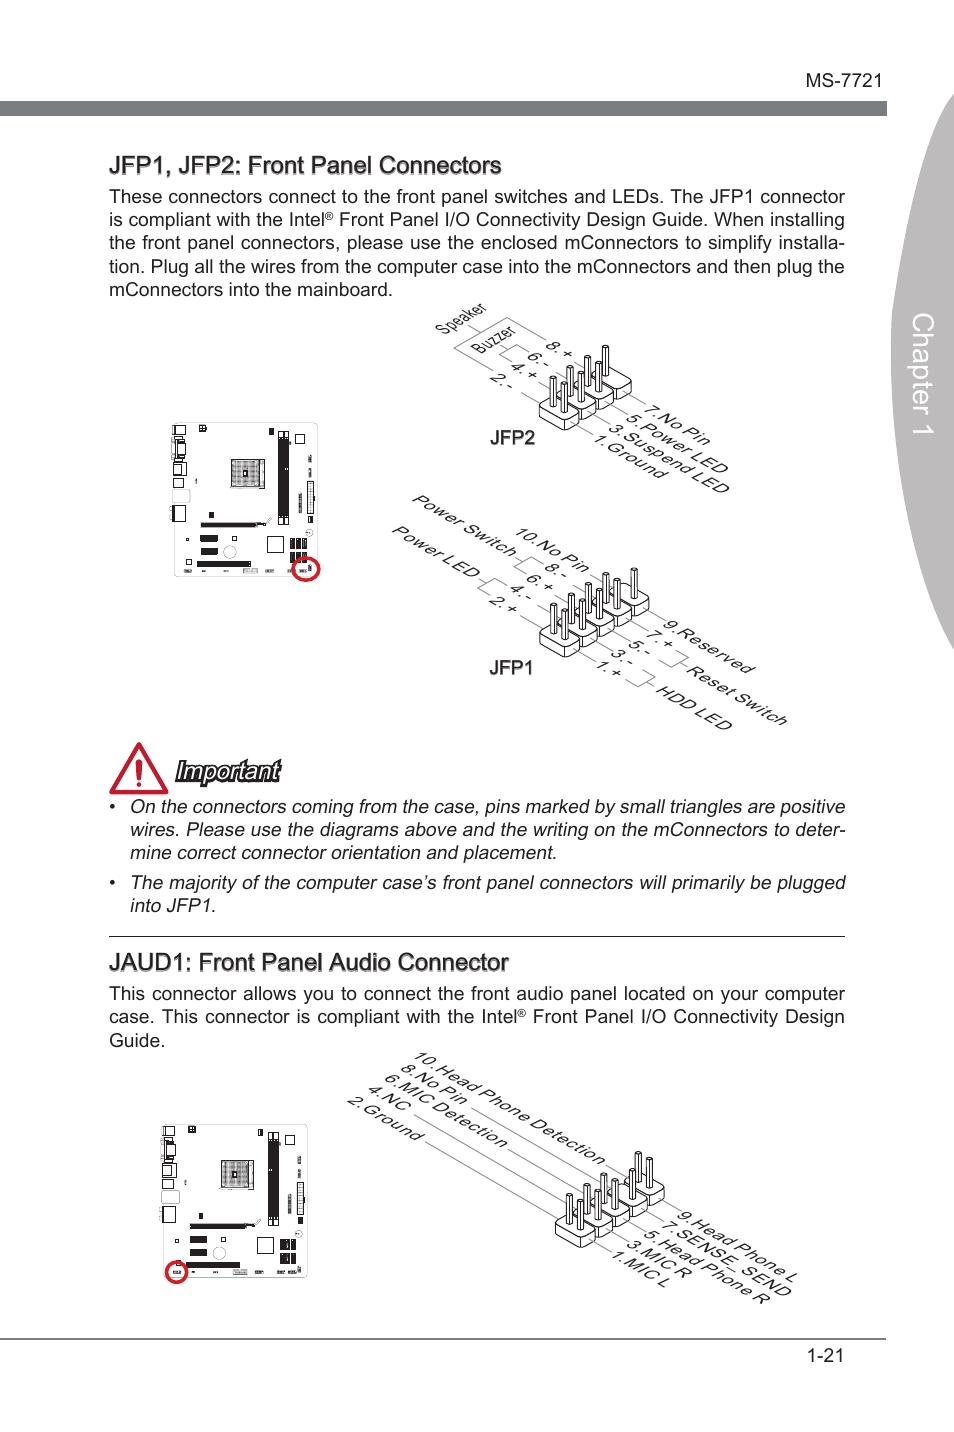 Jaud1: front panel audio connector, Jfp1, jfp2: front panel